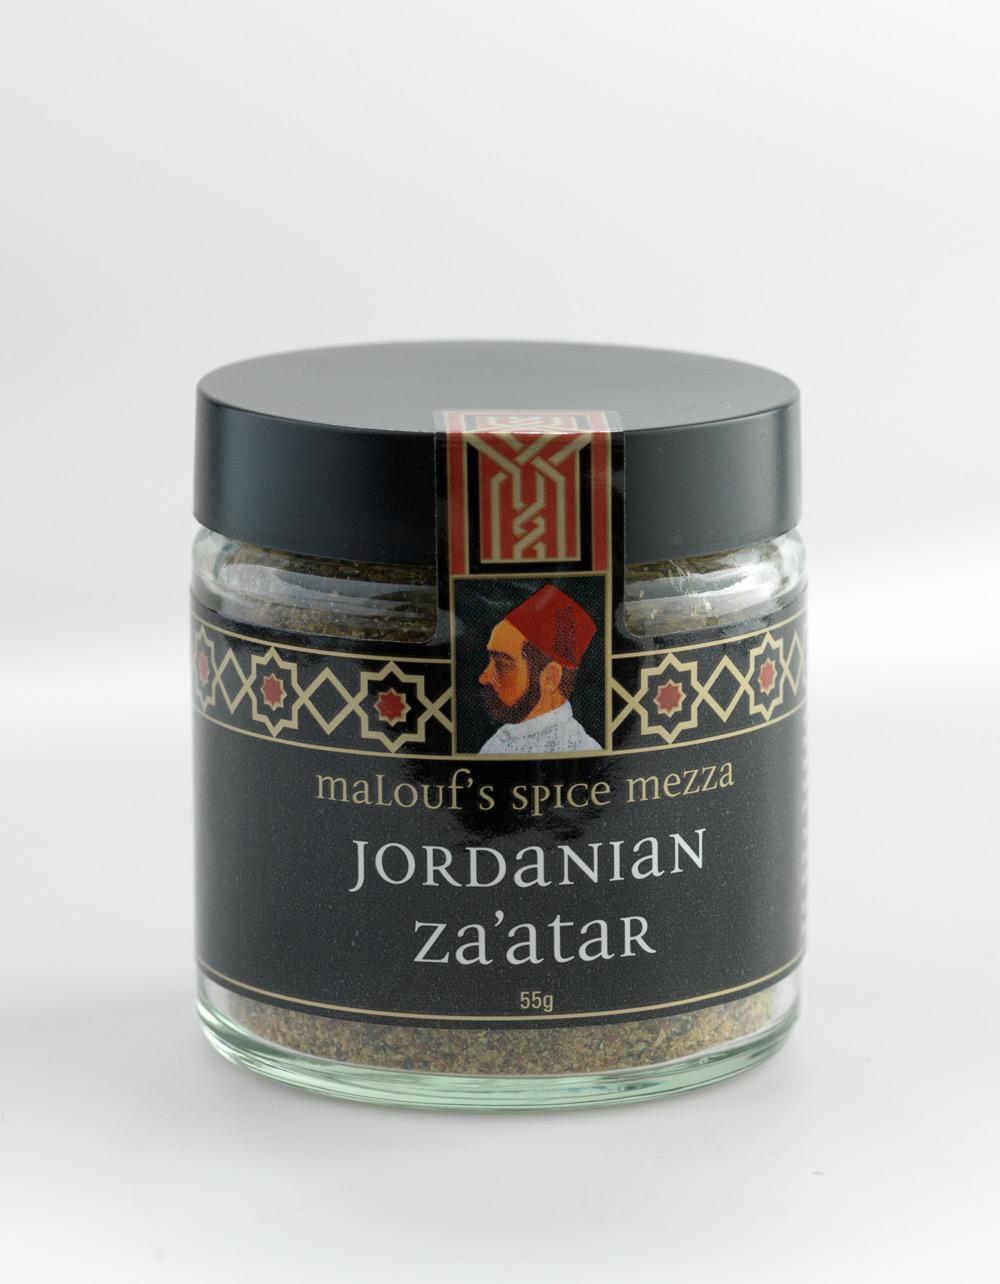 Malouf's Spice Mezza Jordanian Za'atar 55g